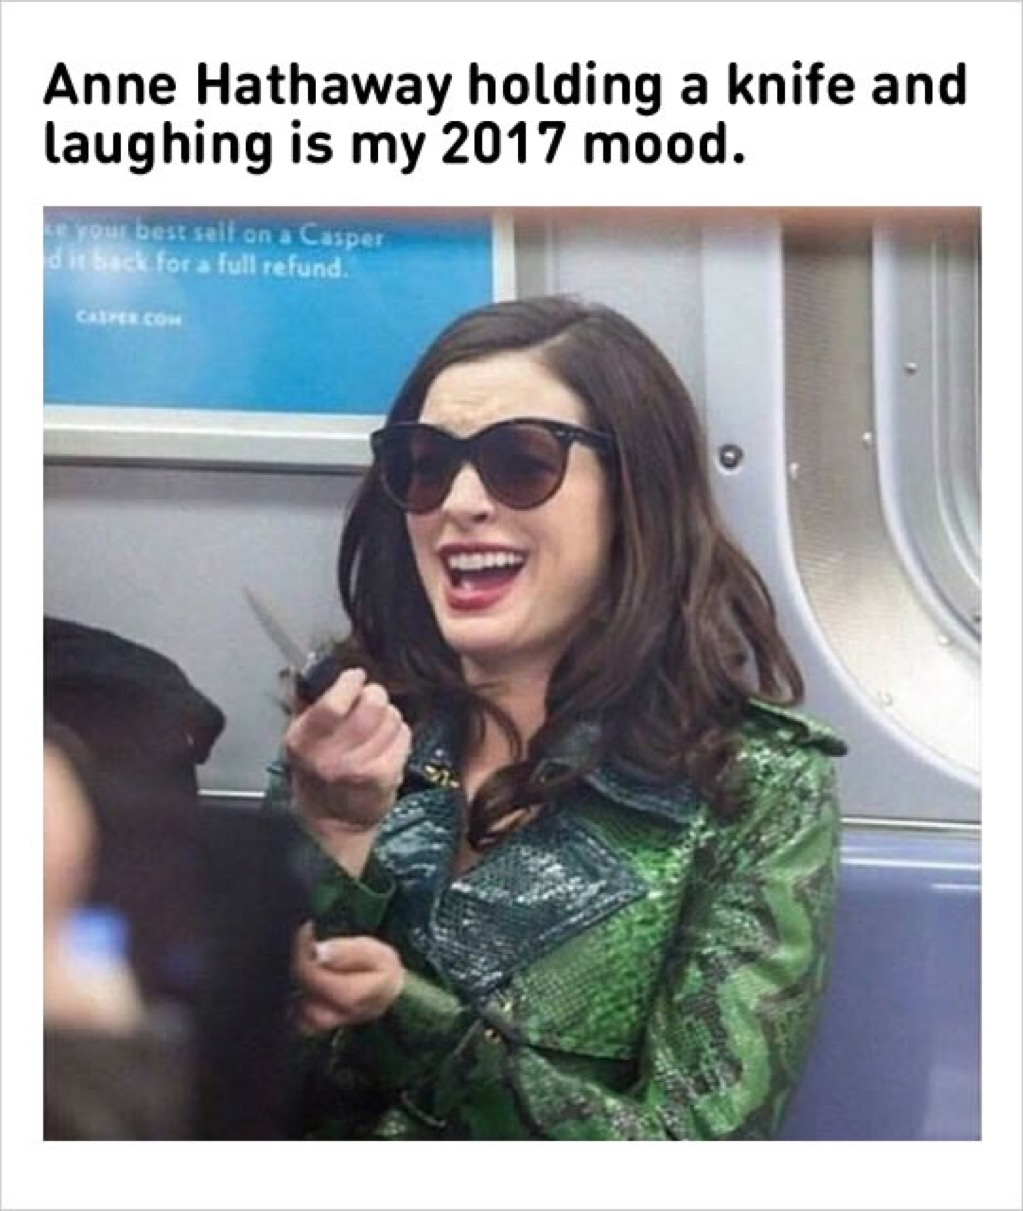 Anne Hathaway knife meme